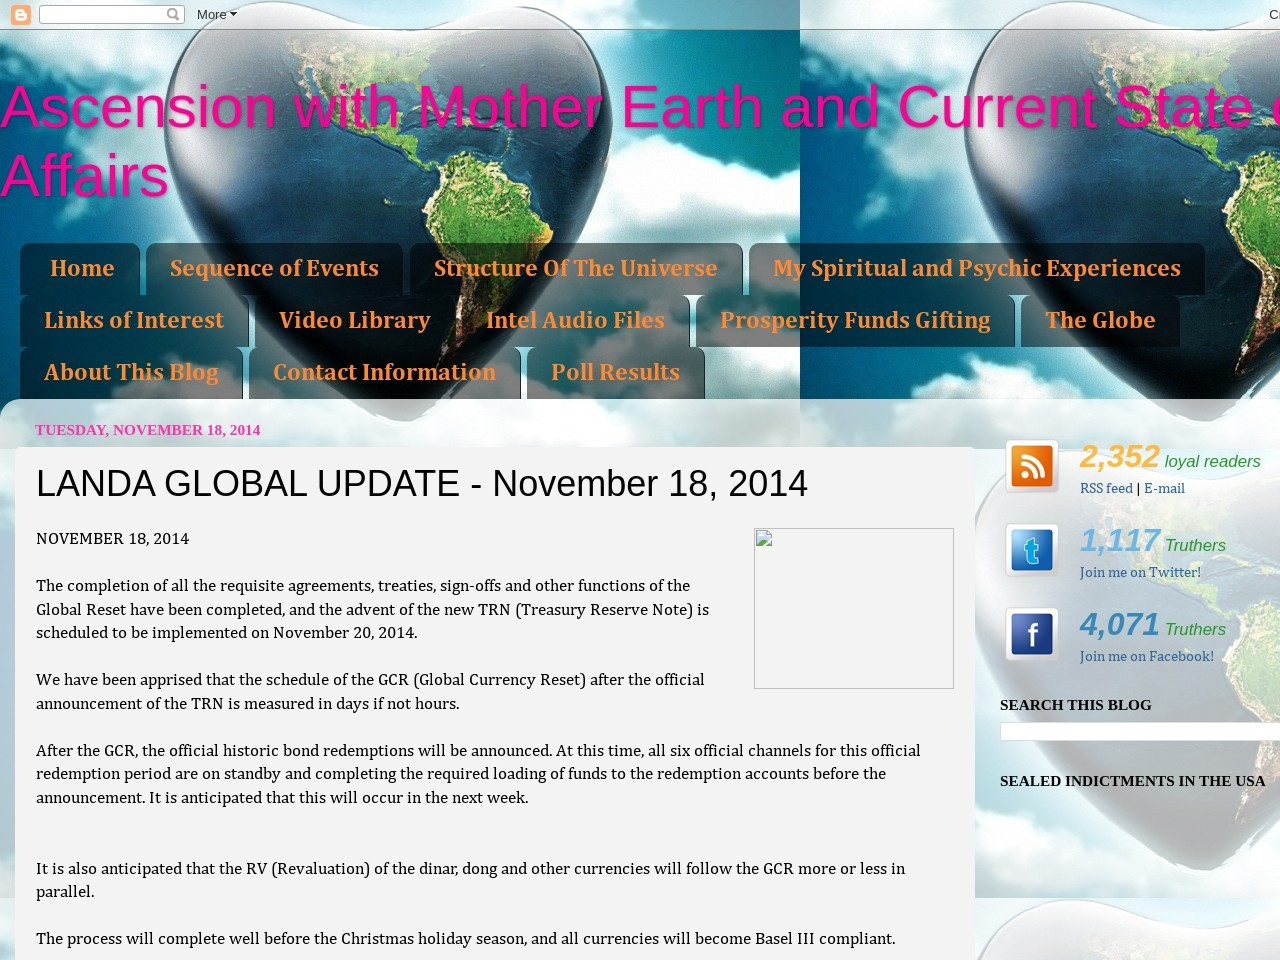 LANDA GLOBAL UPDATE – November 18, 2014